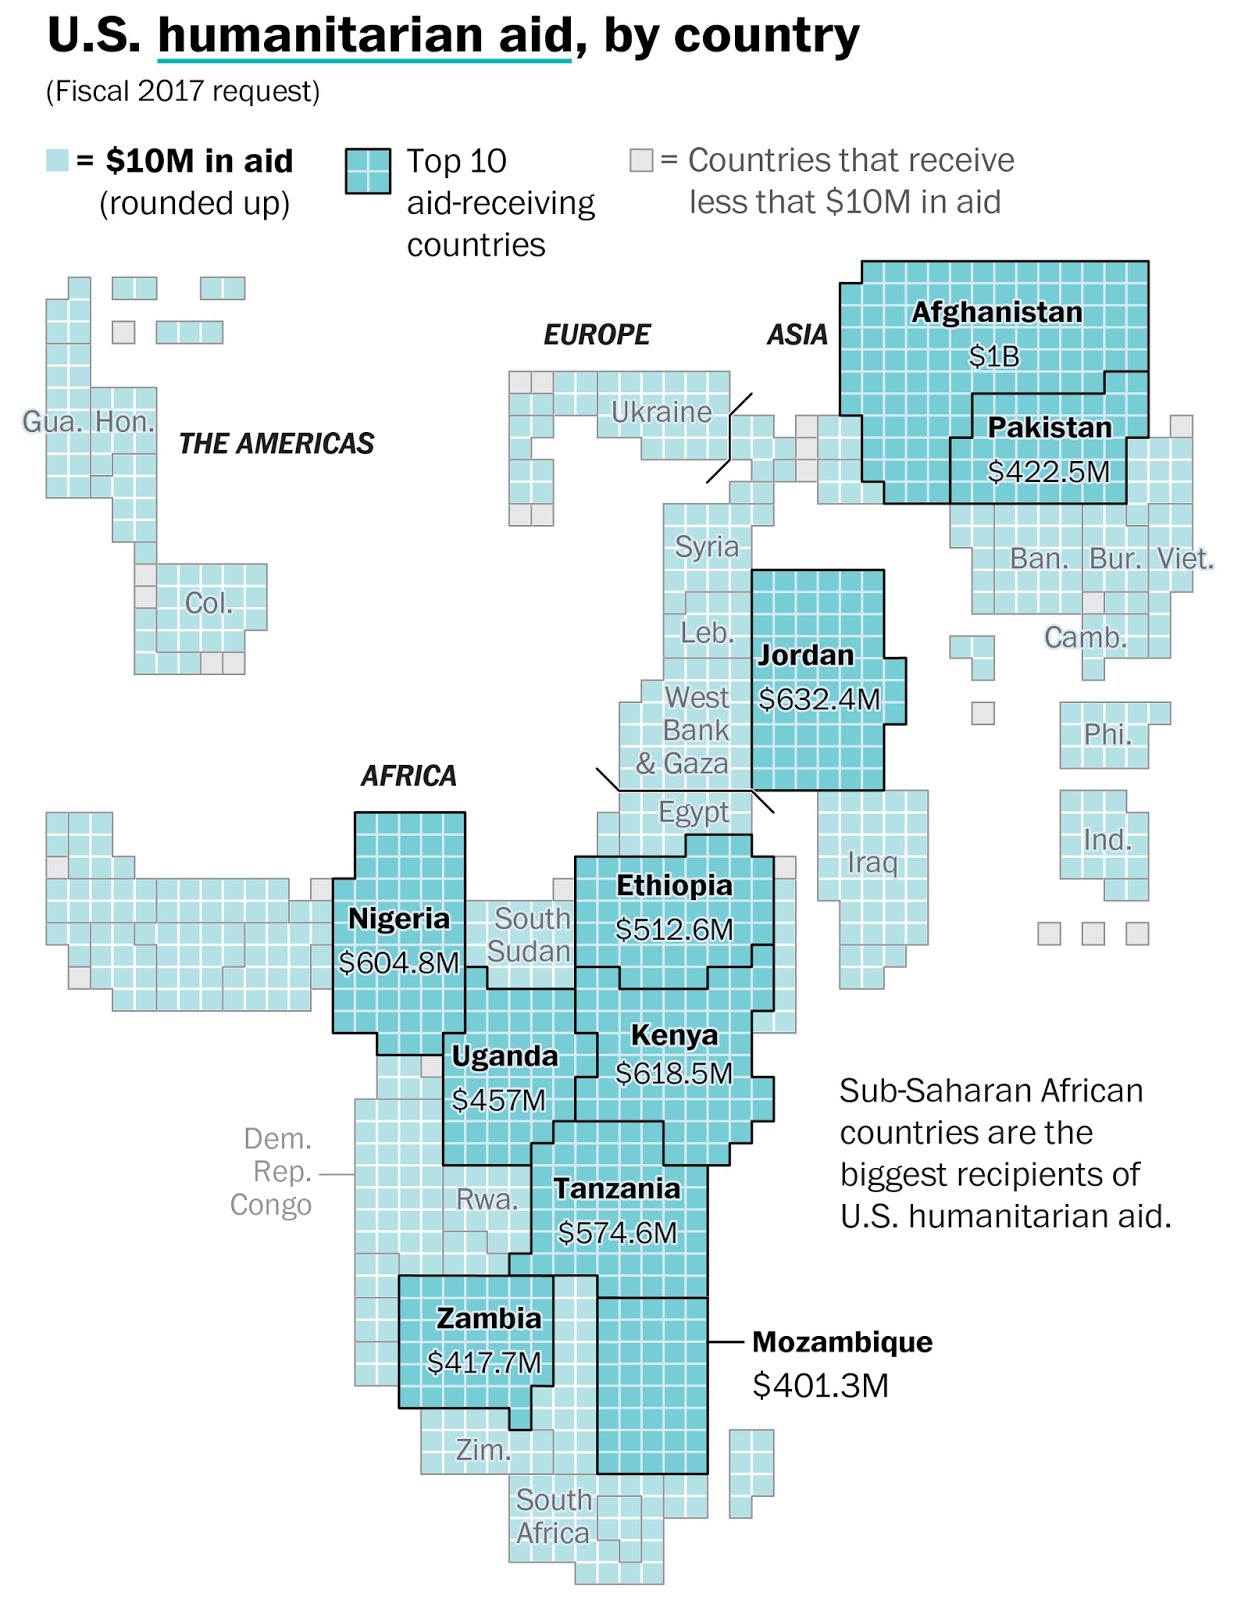 Unites States humanitarian aid